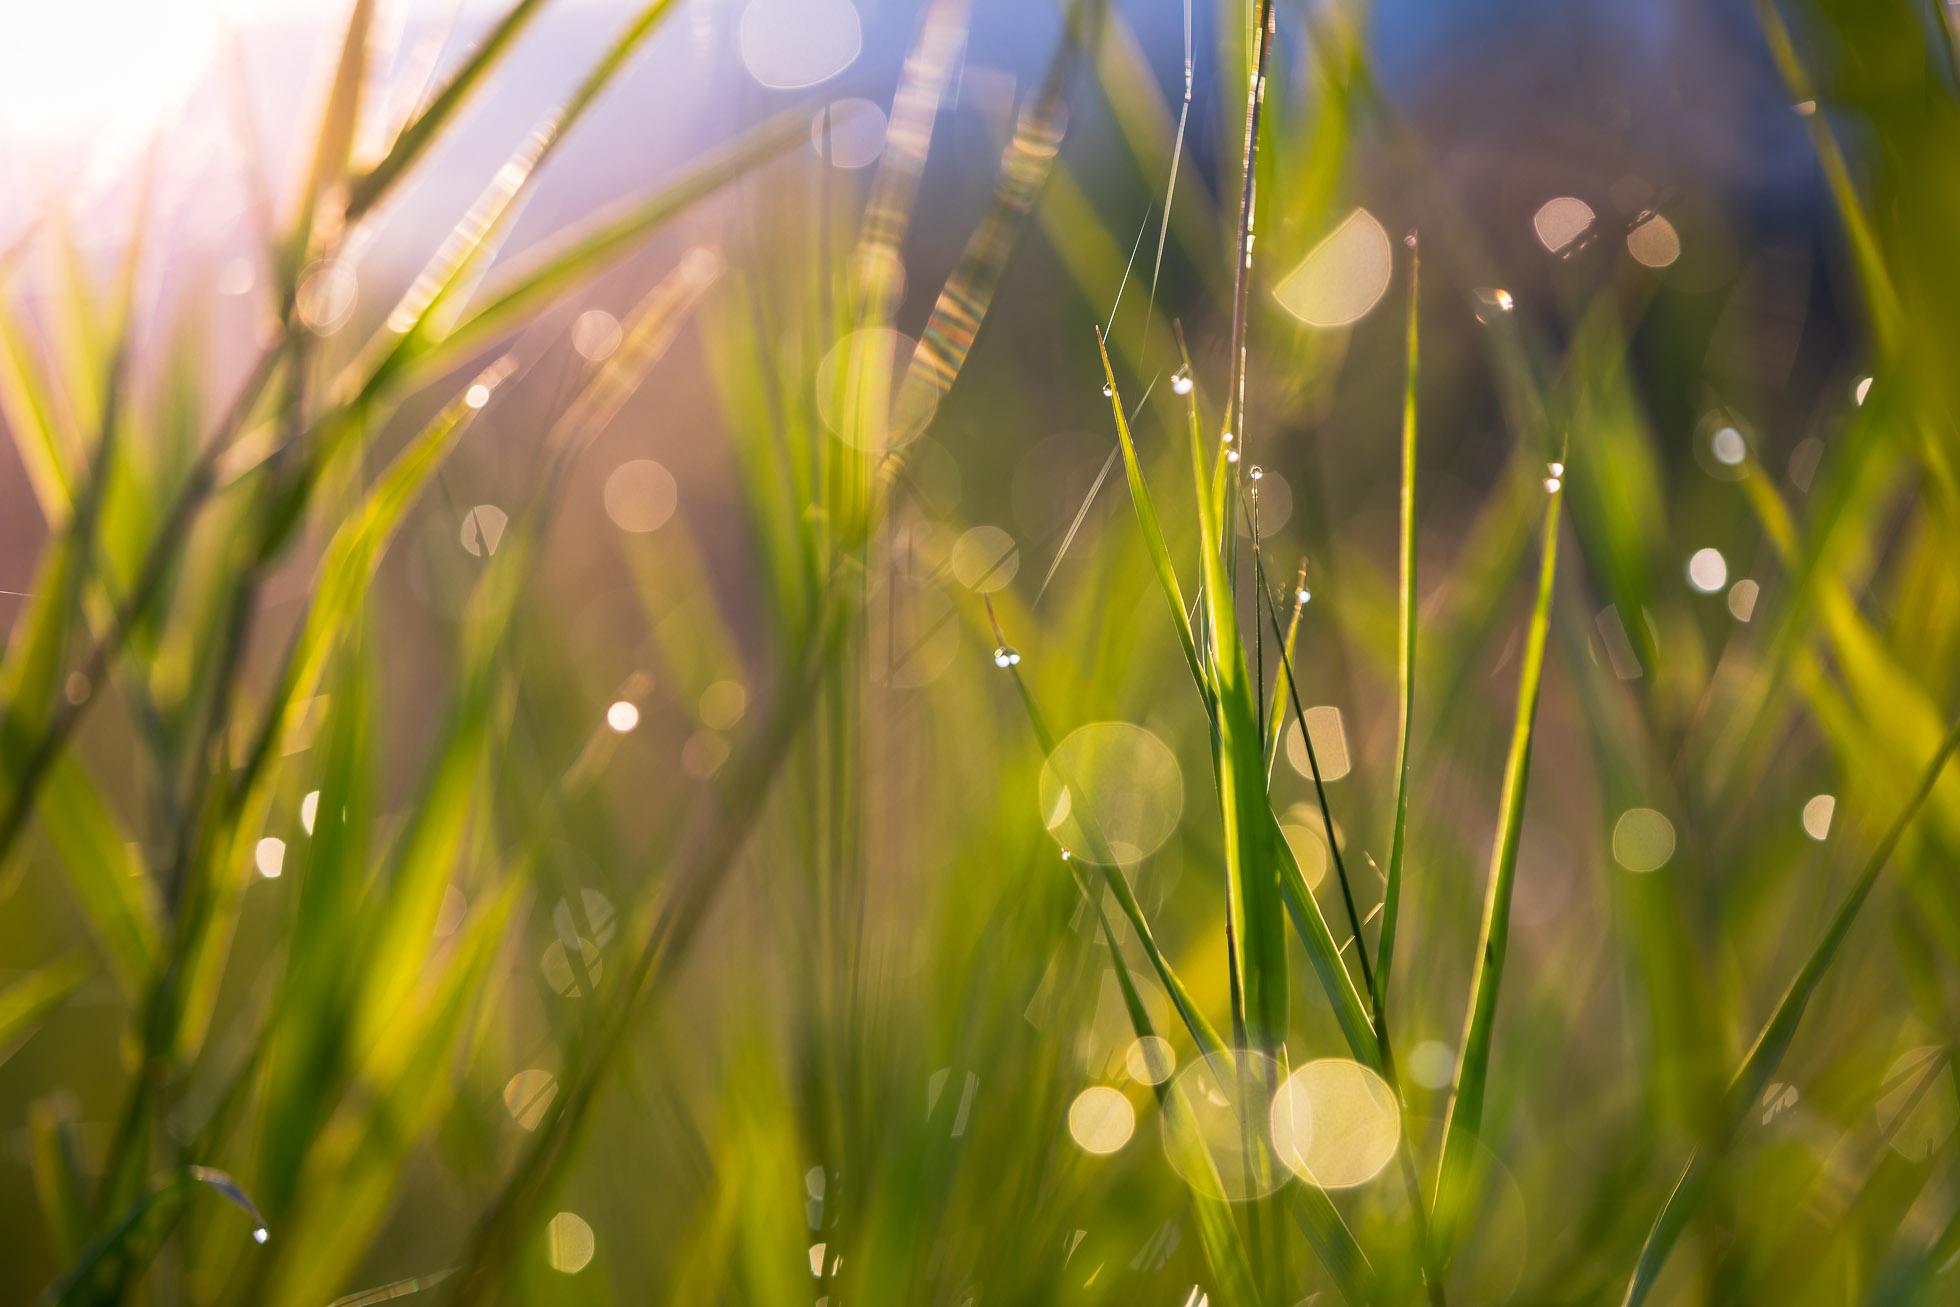 dewdrop bokeh in the grass